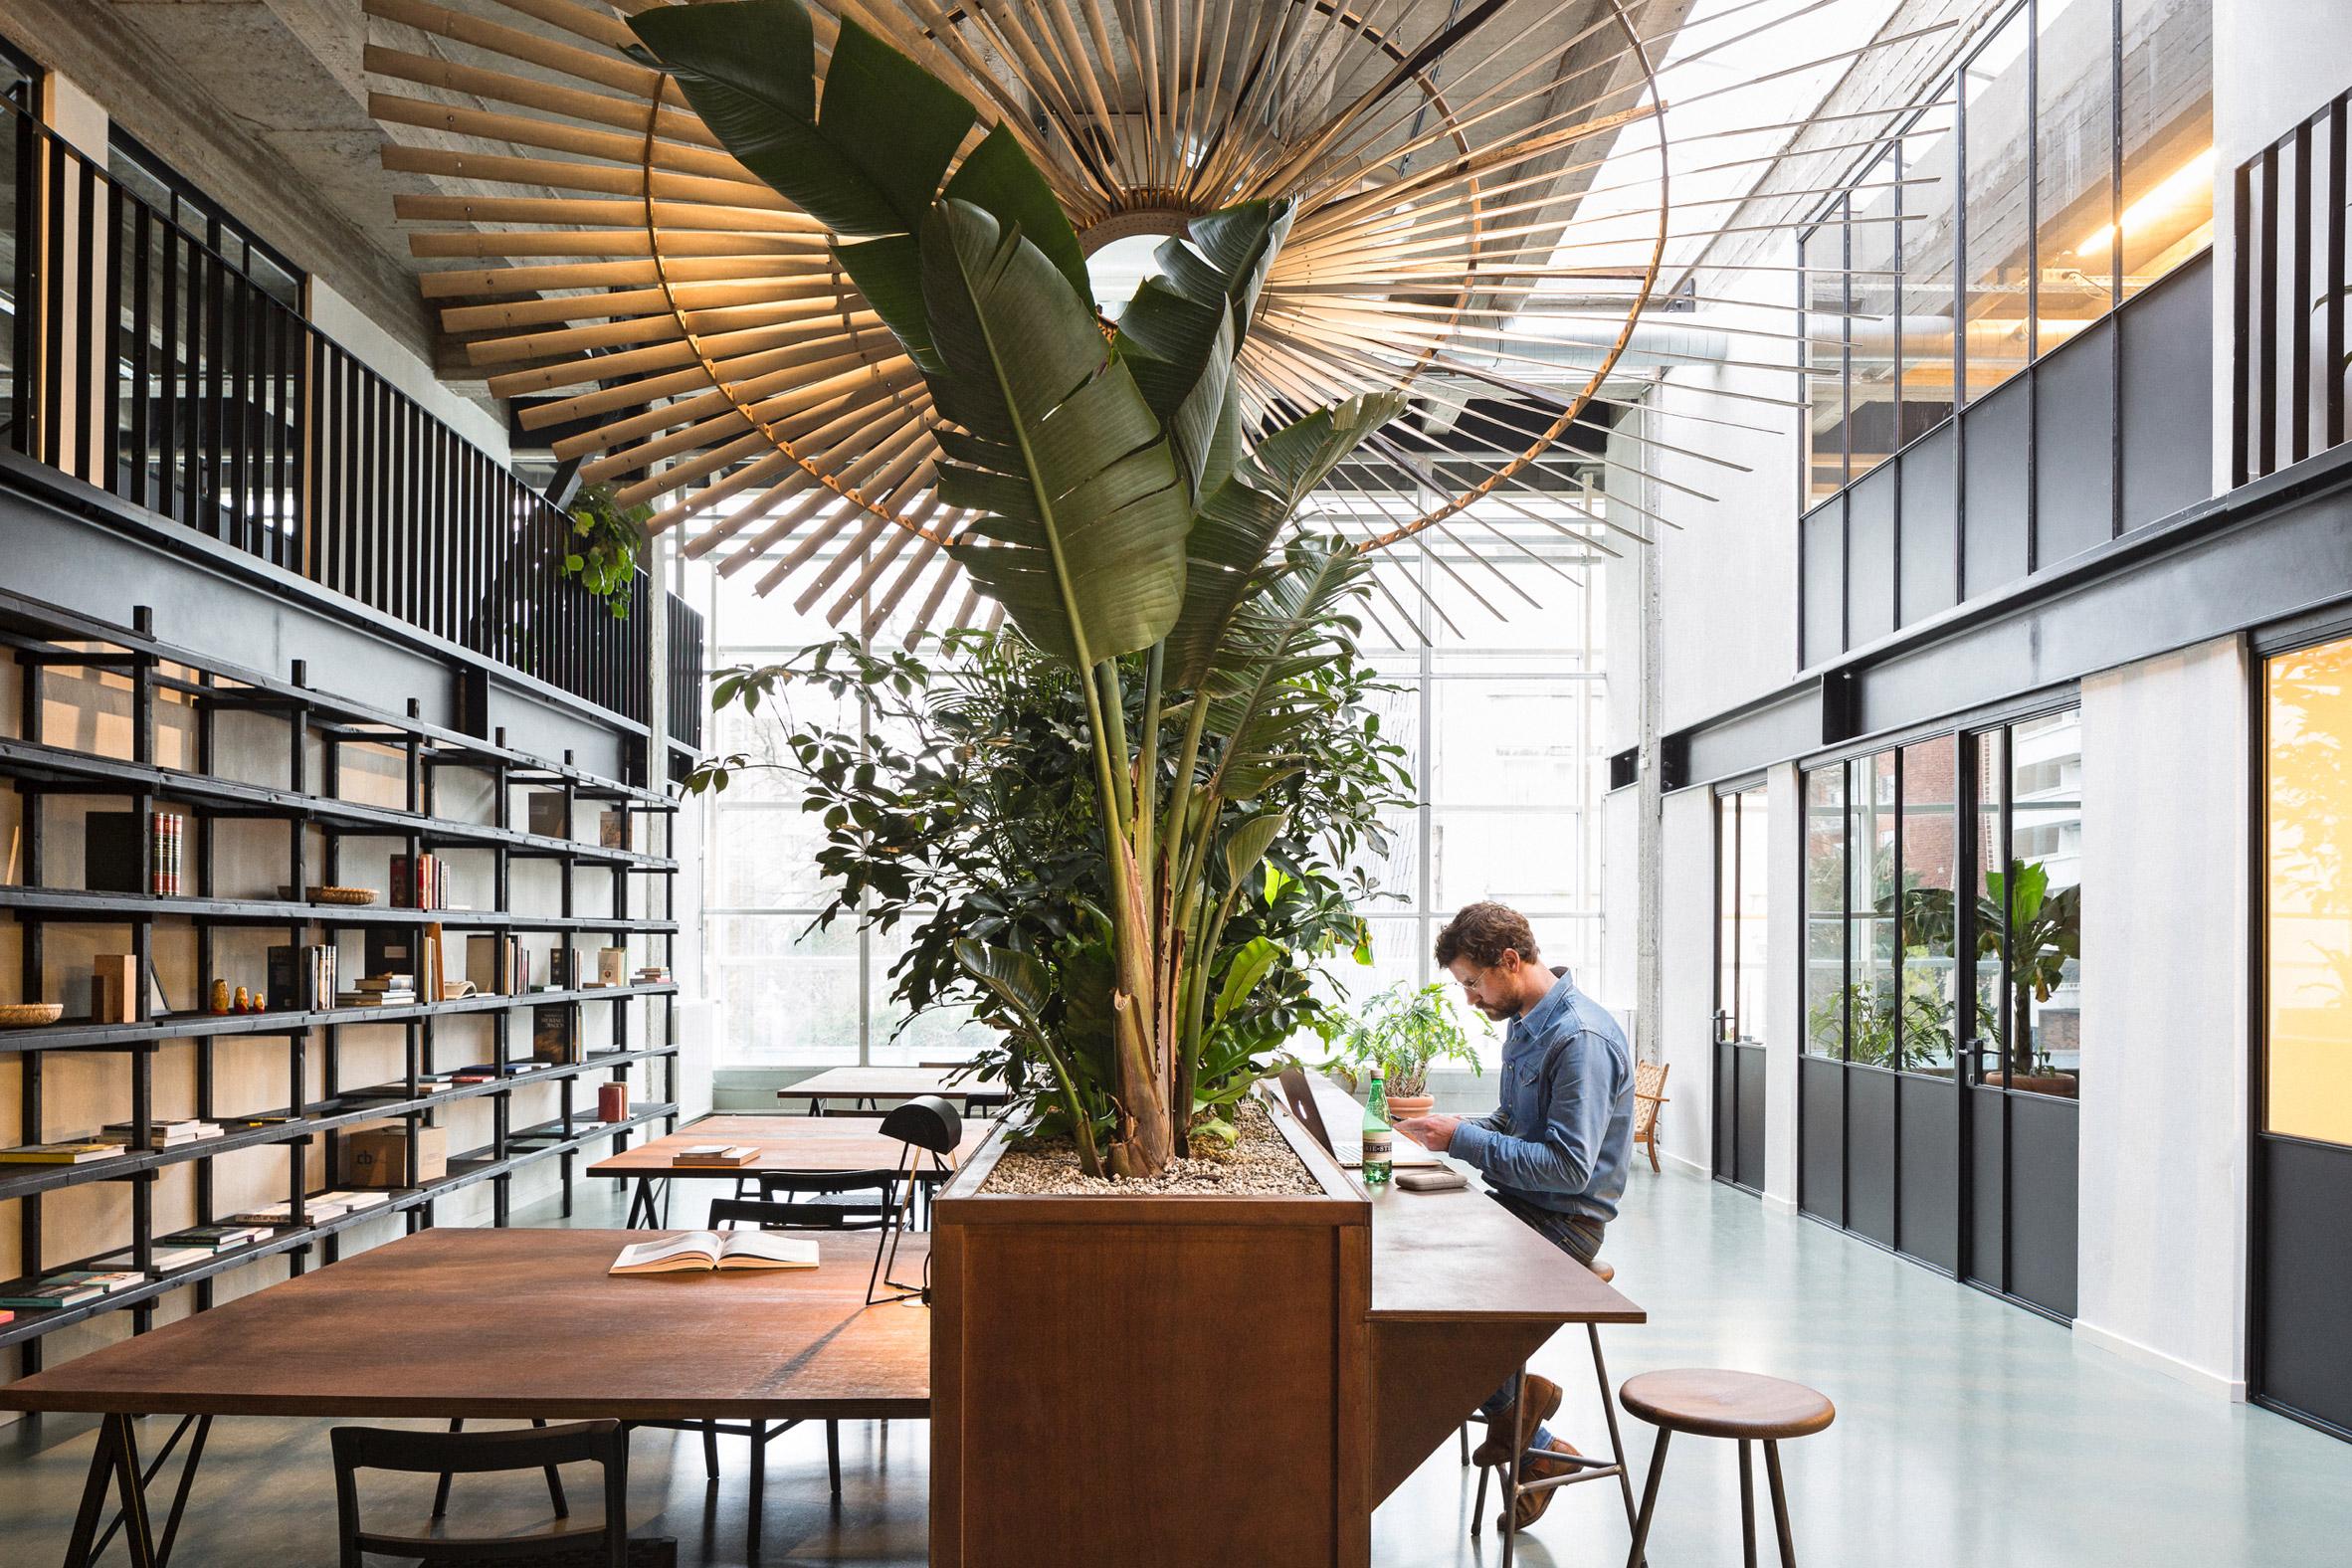 Fosbury & Son co-working space in the WATT-tower, Antwerp